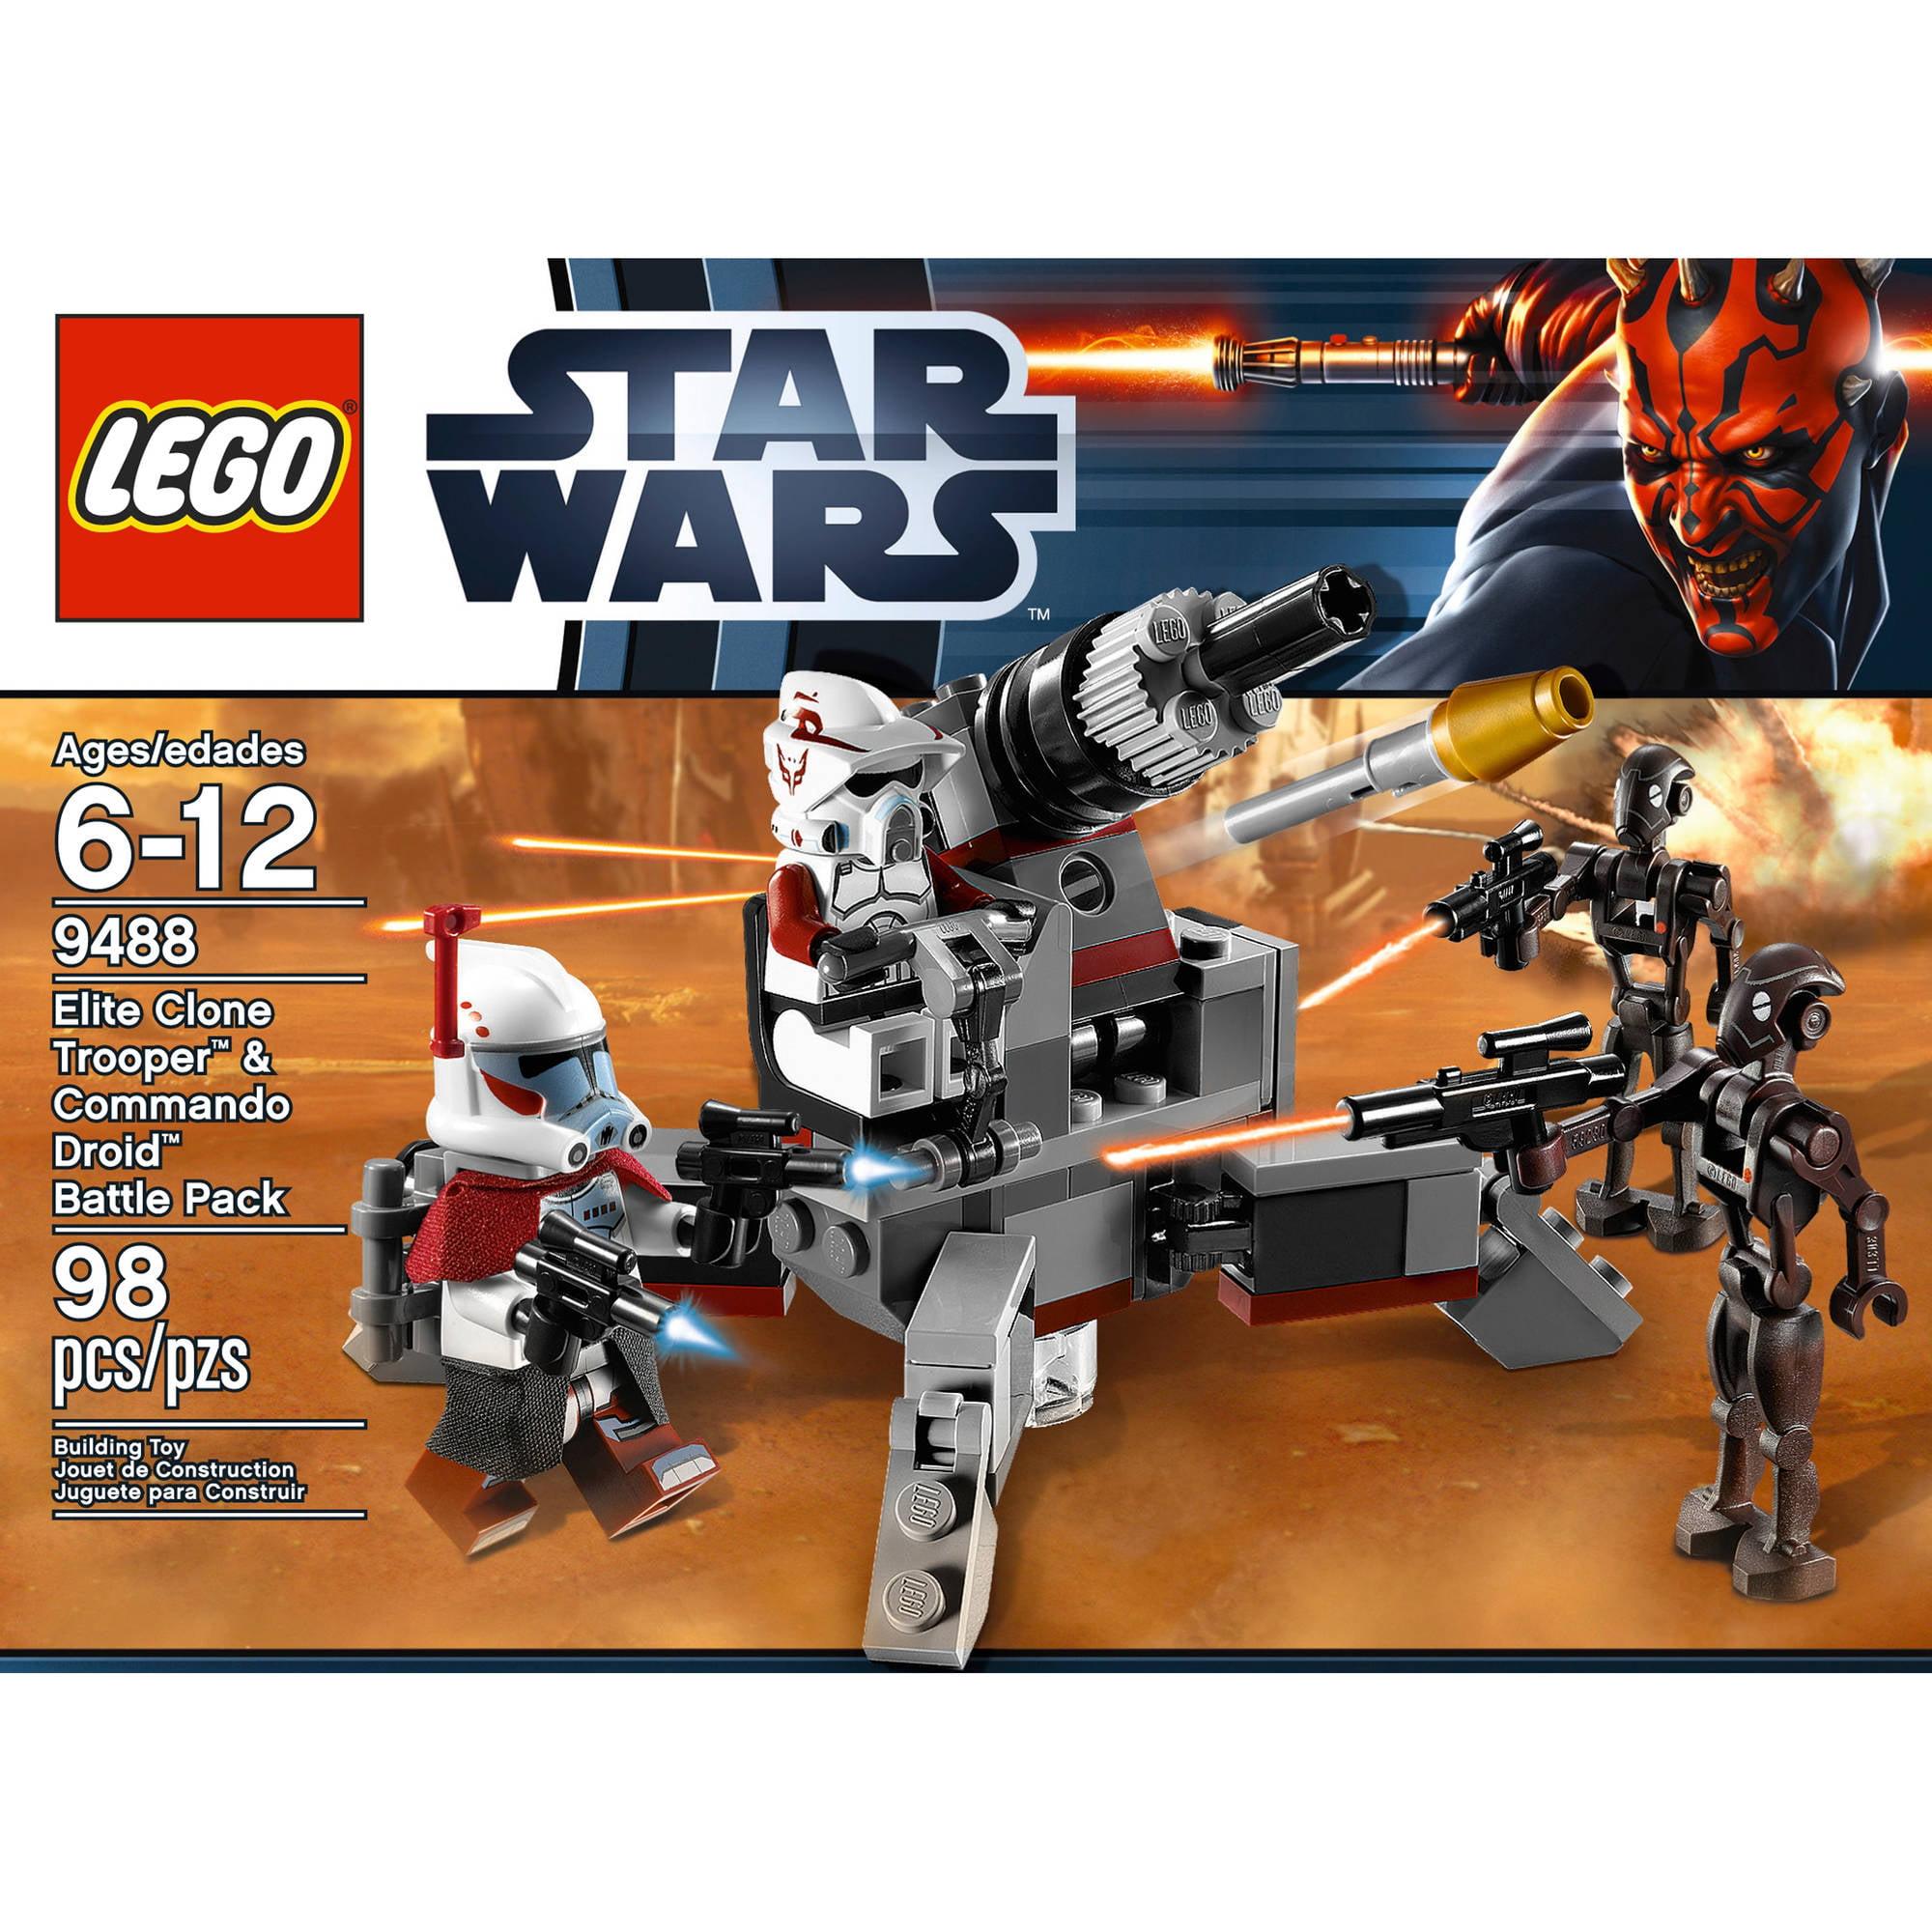 LEGO Star Wars Elite Clone Troopers and Commando Droid B - Walmart.com a51b42daee